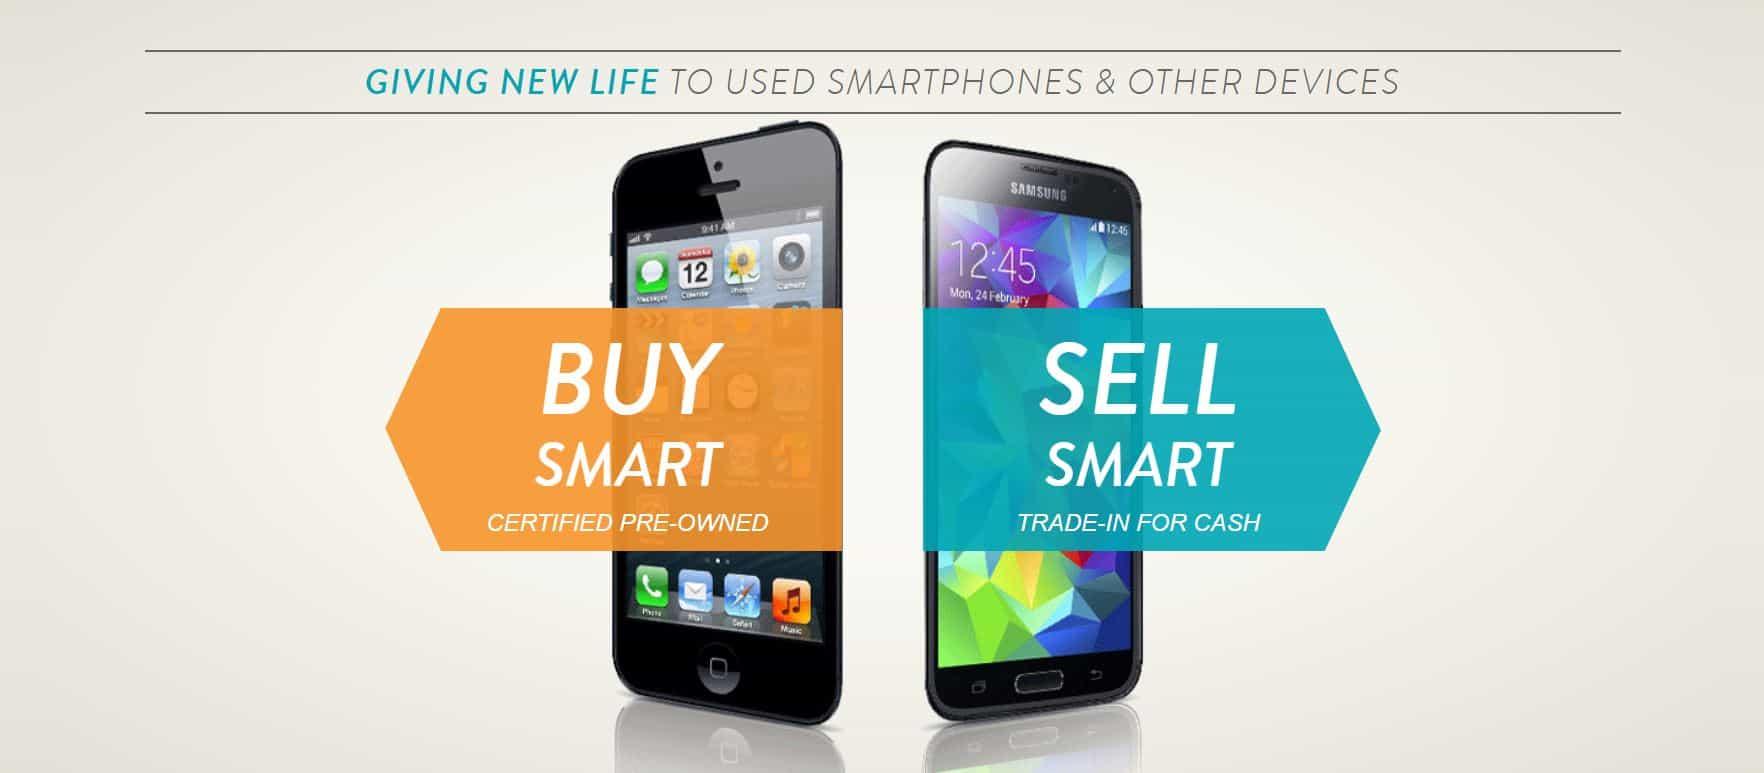 Selling phones on Gazelle